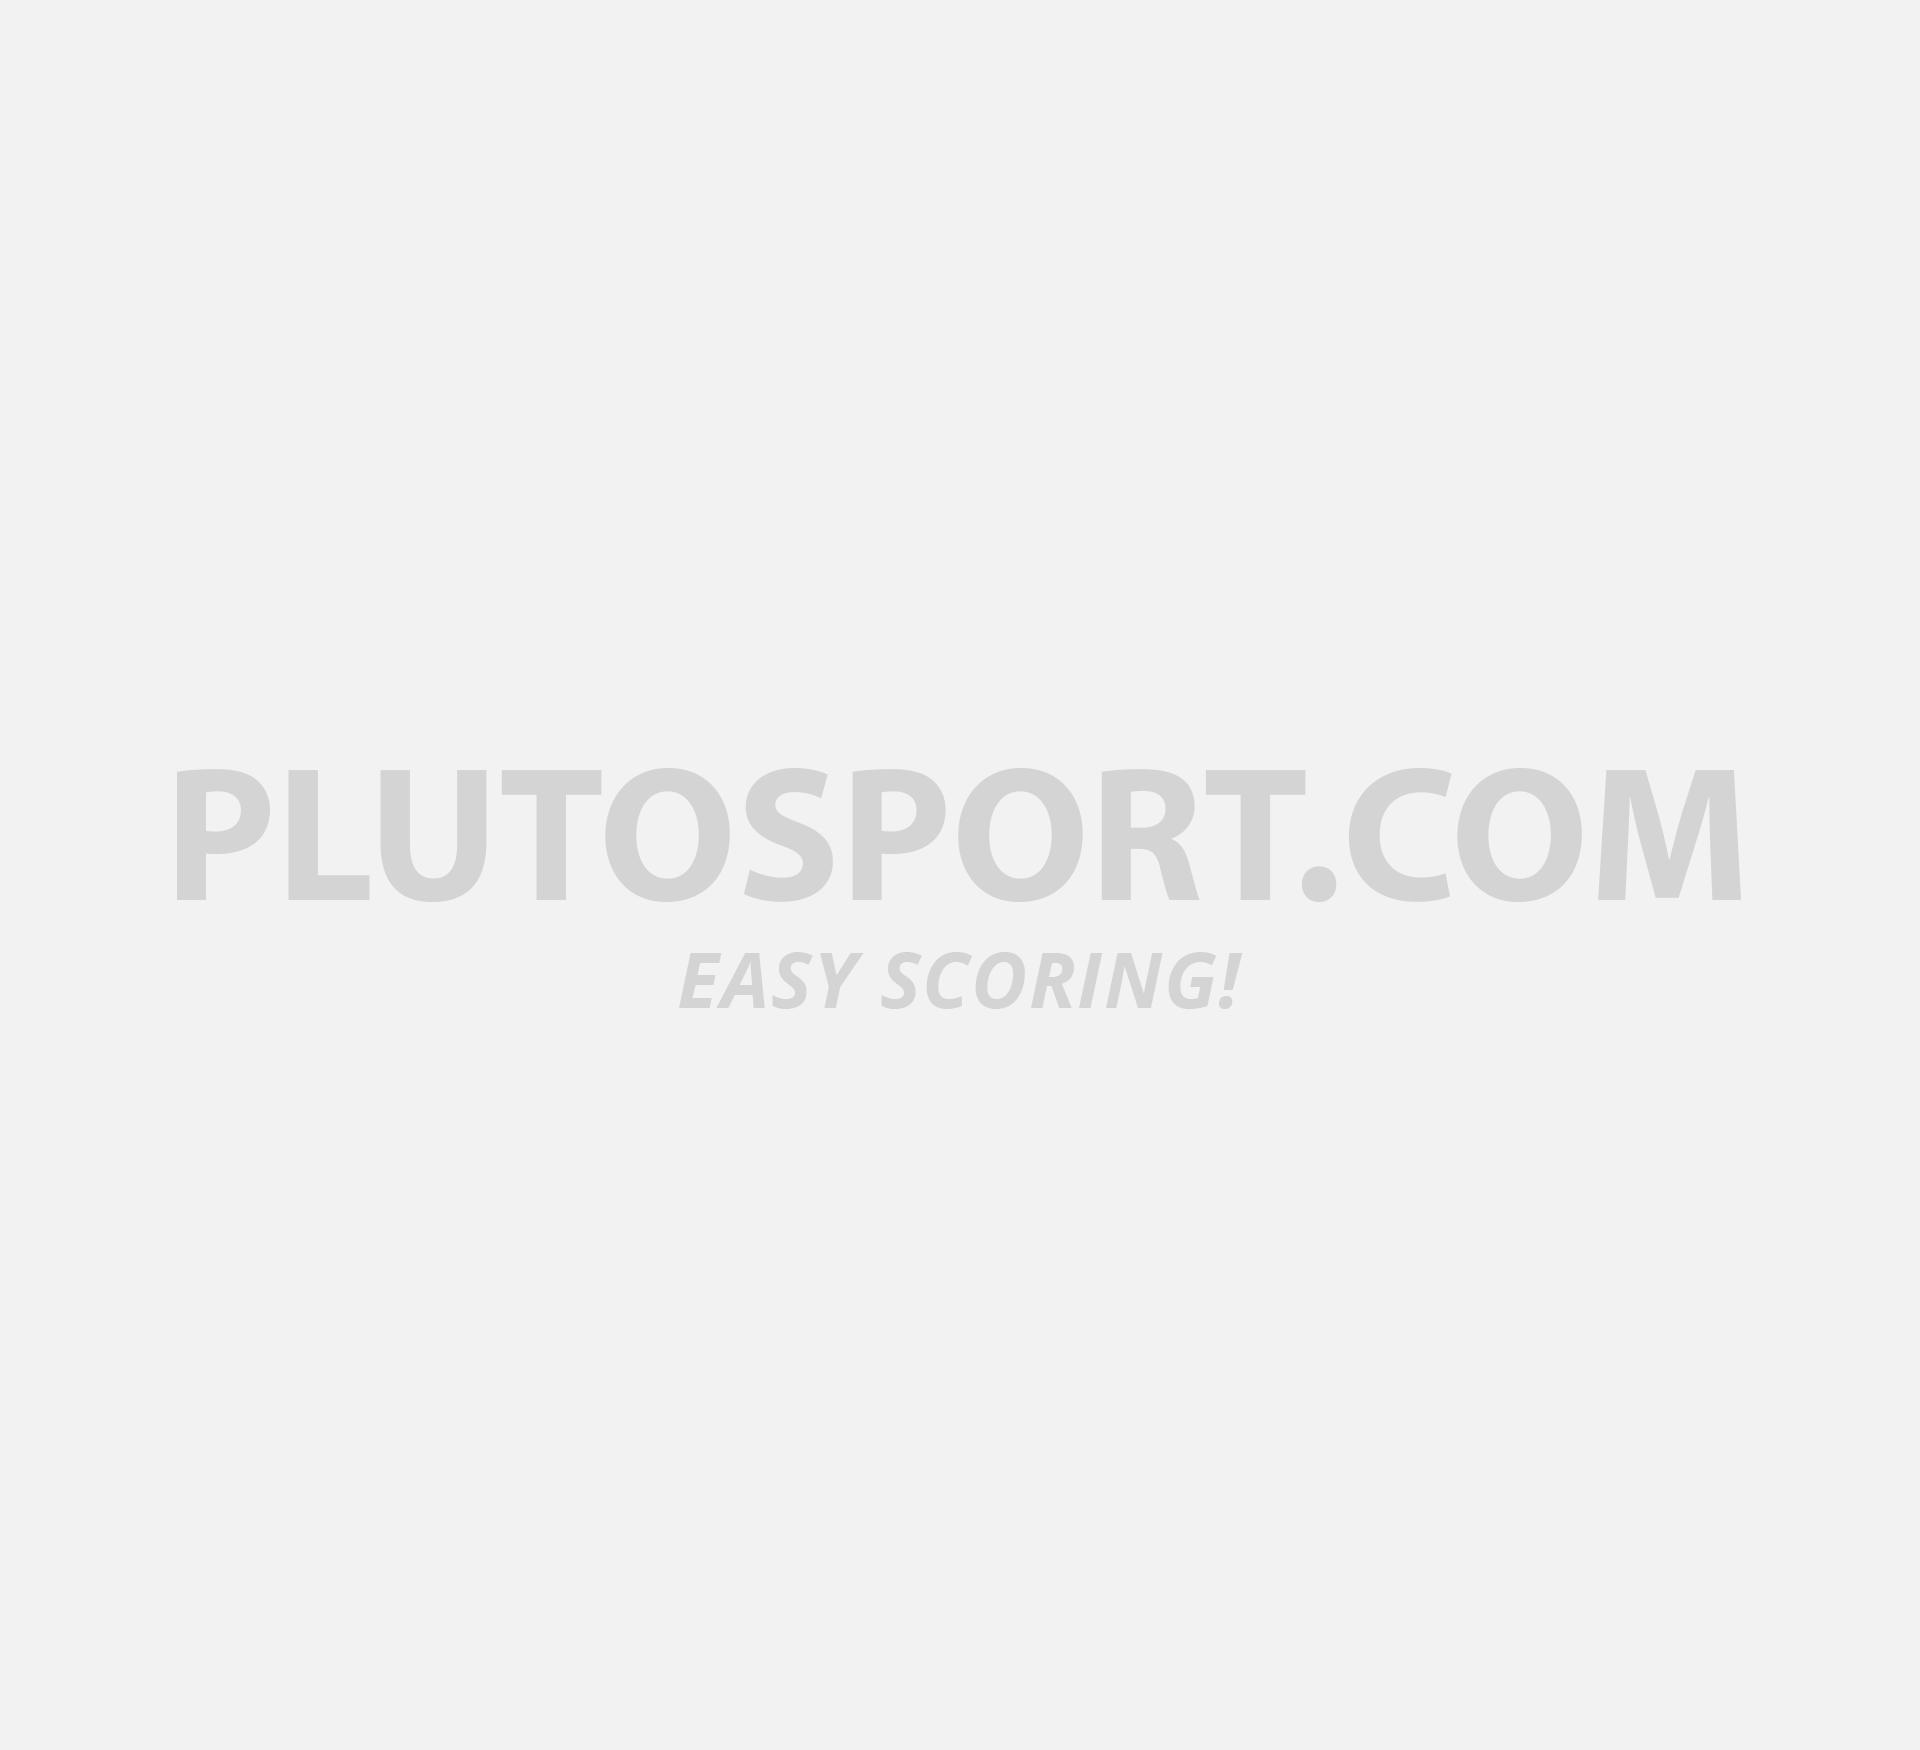 fcea085f4797e8 Adidas Copa 17.4 TF Jr - Turf shoes - Shoes - Football - Sports ...